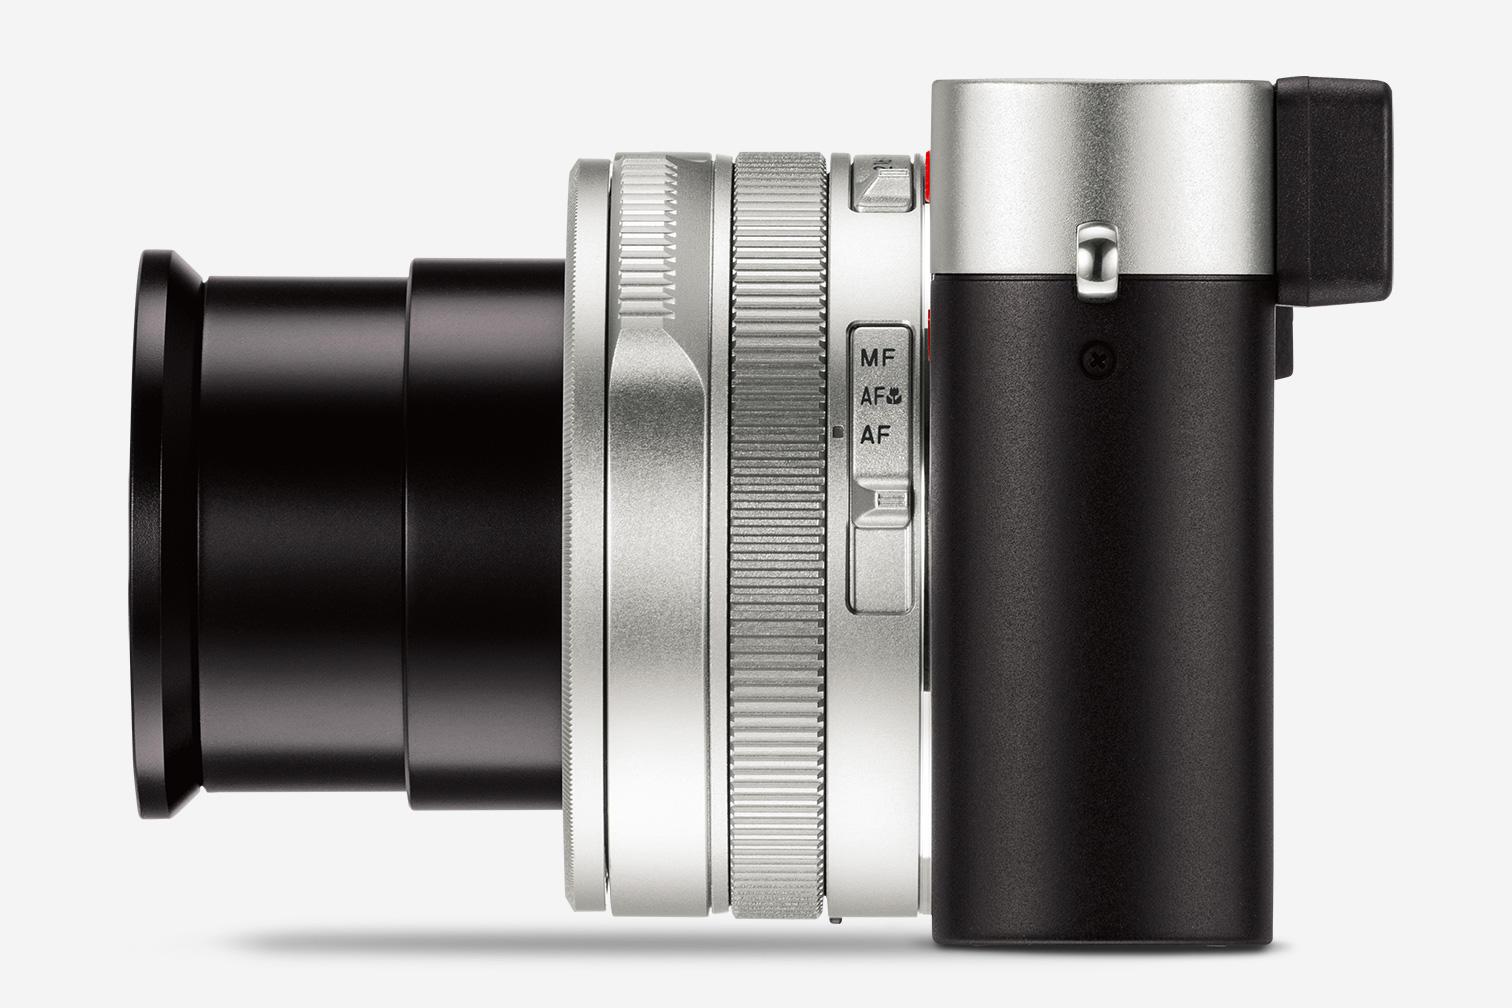 Leica-D-Lux-7-left-|-1512x1008-BG-f4f4f4_teaser-2632x1756